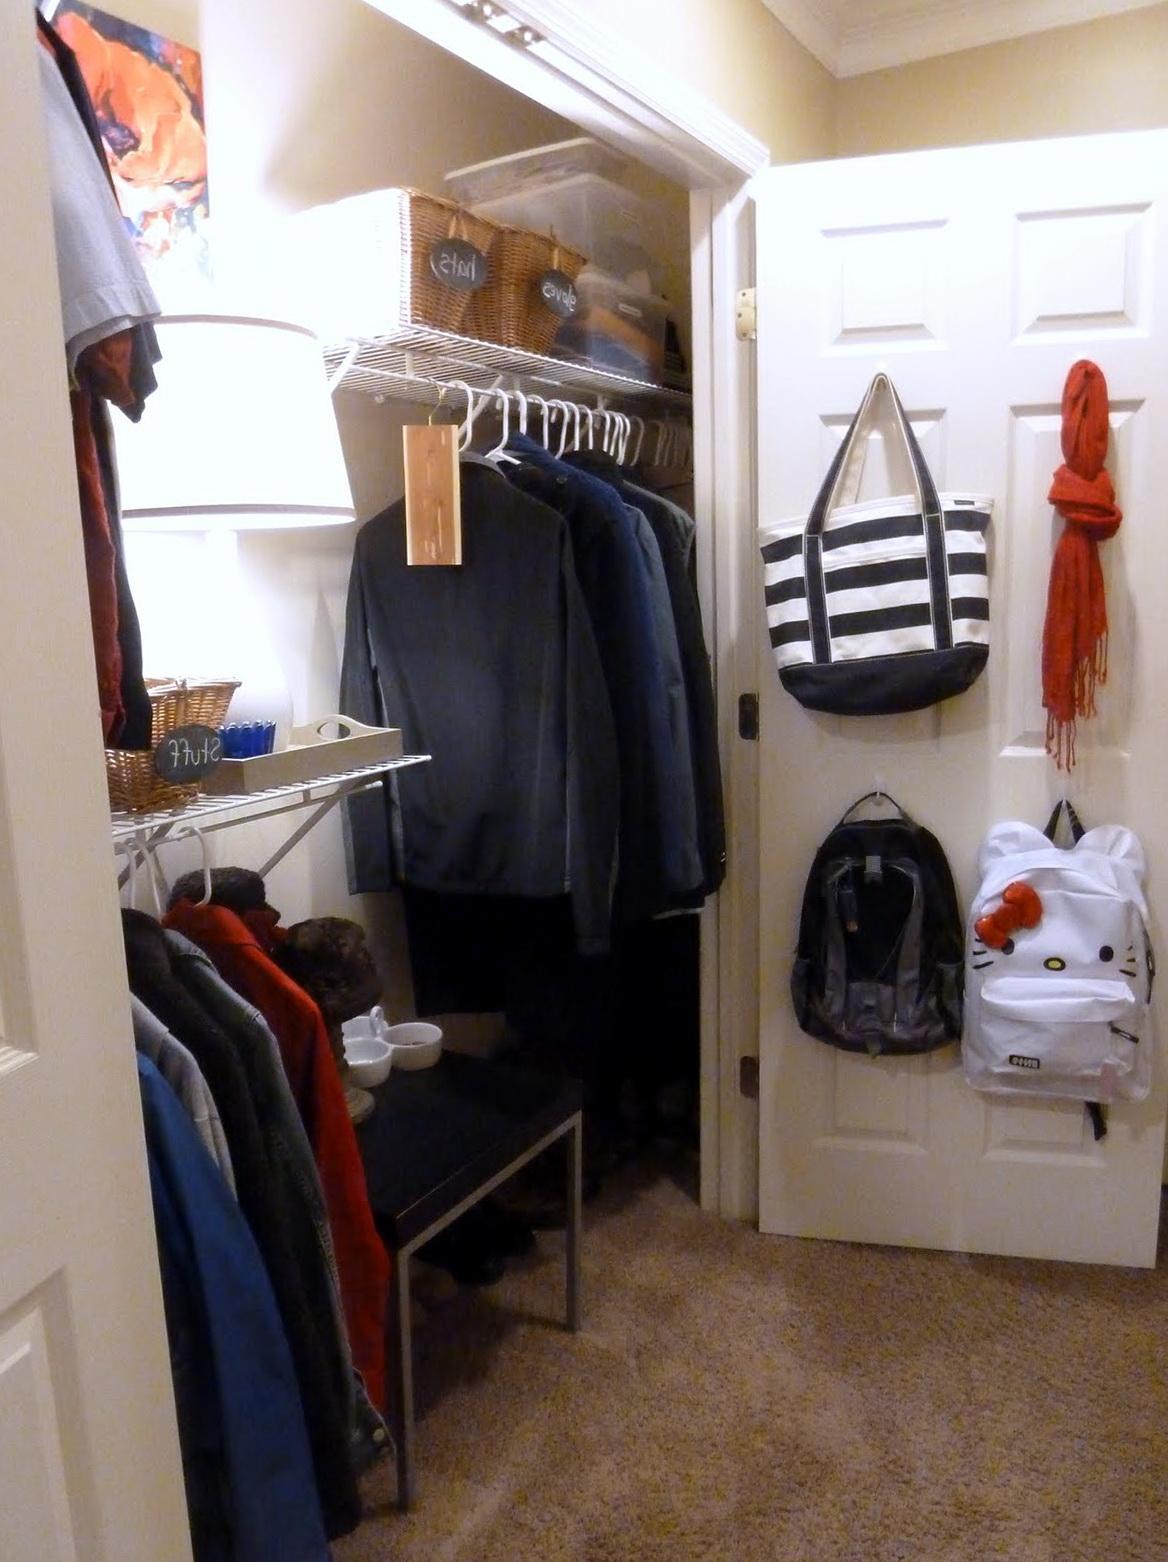 Organized Coat Closet Ideas